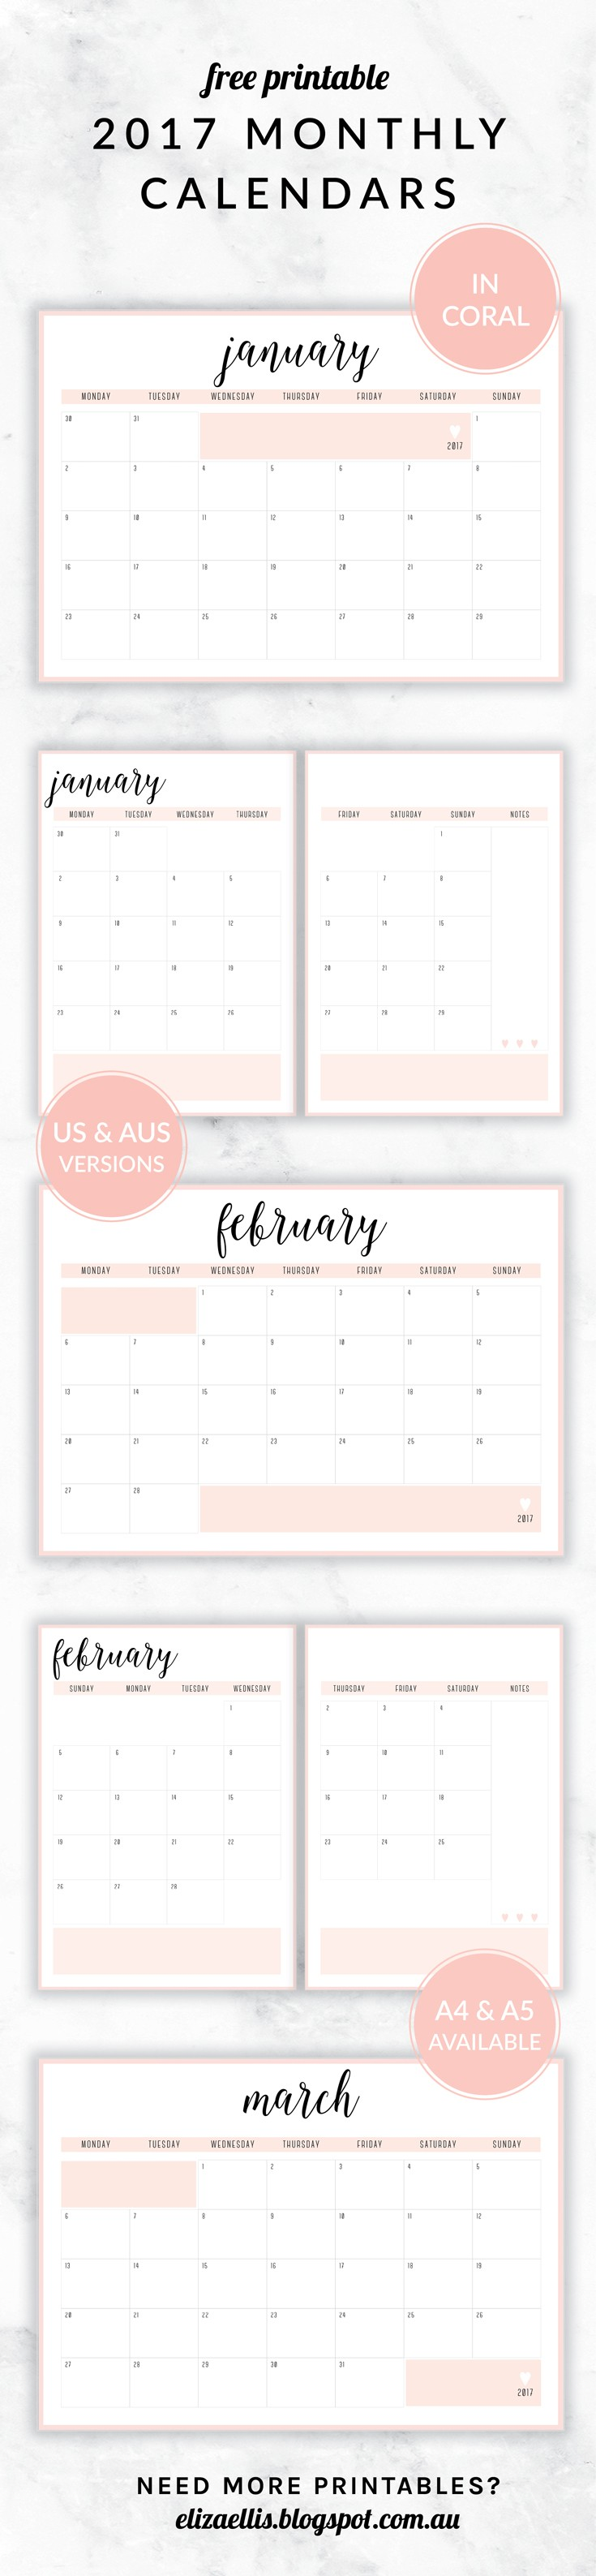 Imprimir Calendario Semanal 2017 Más Actual Free Printable 2017 Irma Collection Monthly Calendars by Eliza Of Imprimir Calendario Semanal 2017 Mejores Y Más Novedosos ✧pin & Insta Ninabubblygum✧ Portadas